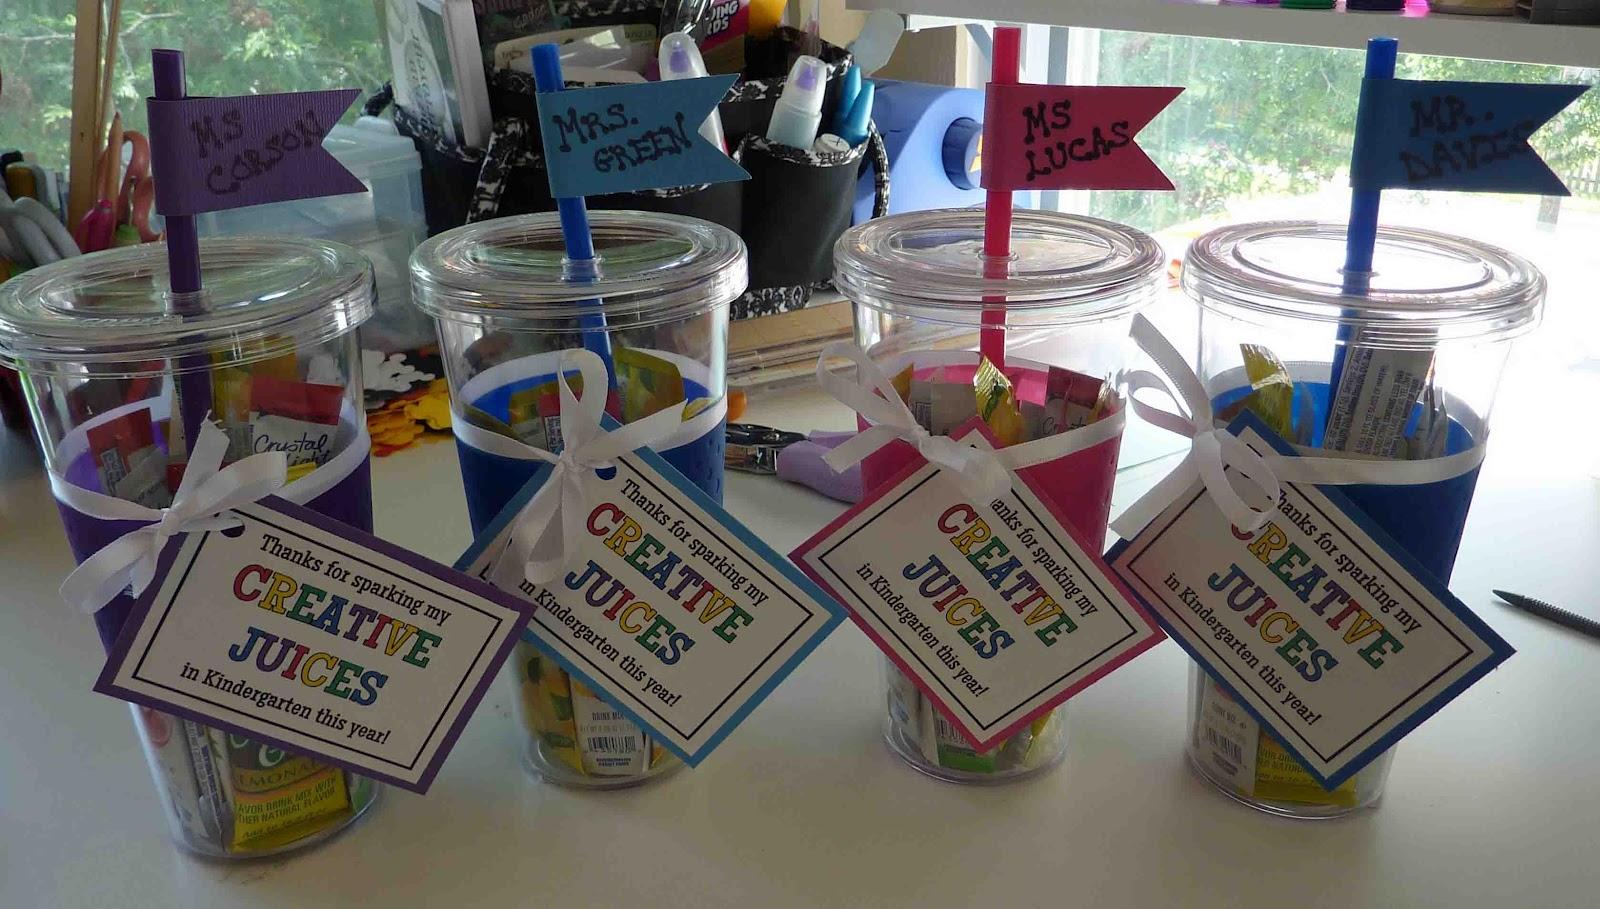 Cool Beans By Lb Teacher Gift Part 1 Creative Juices